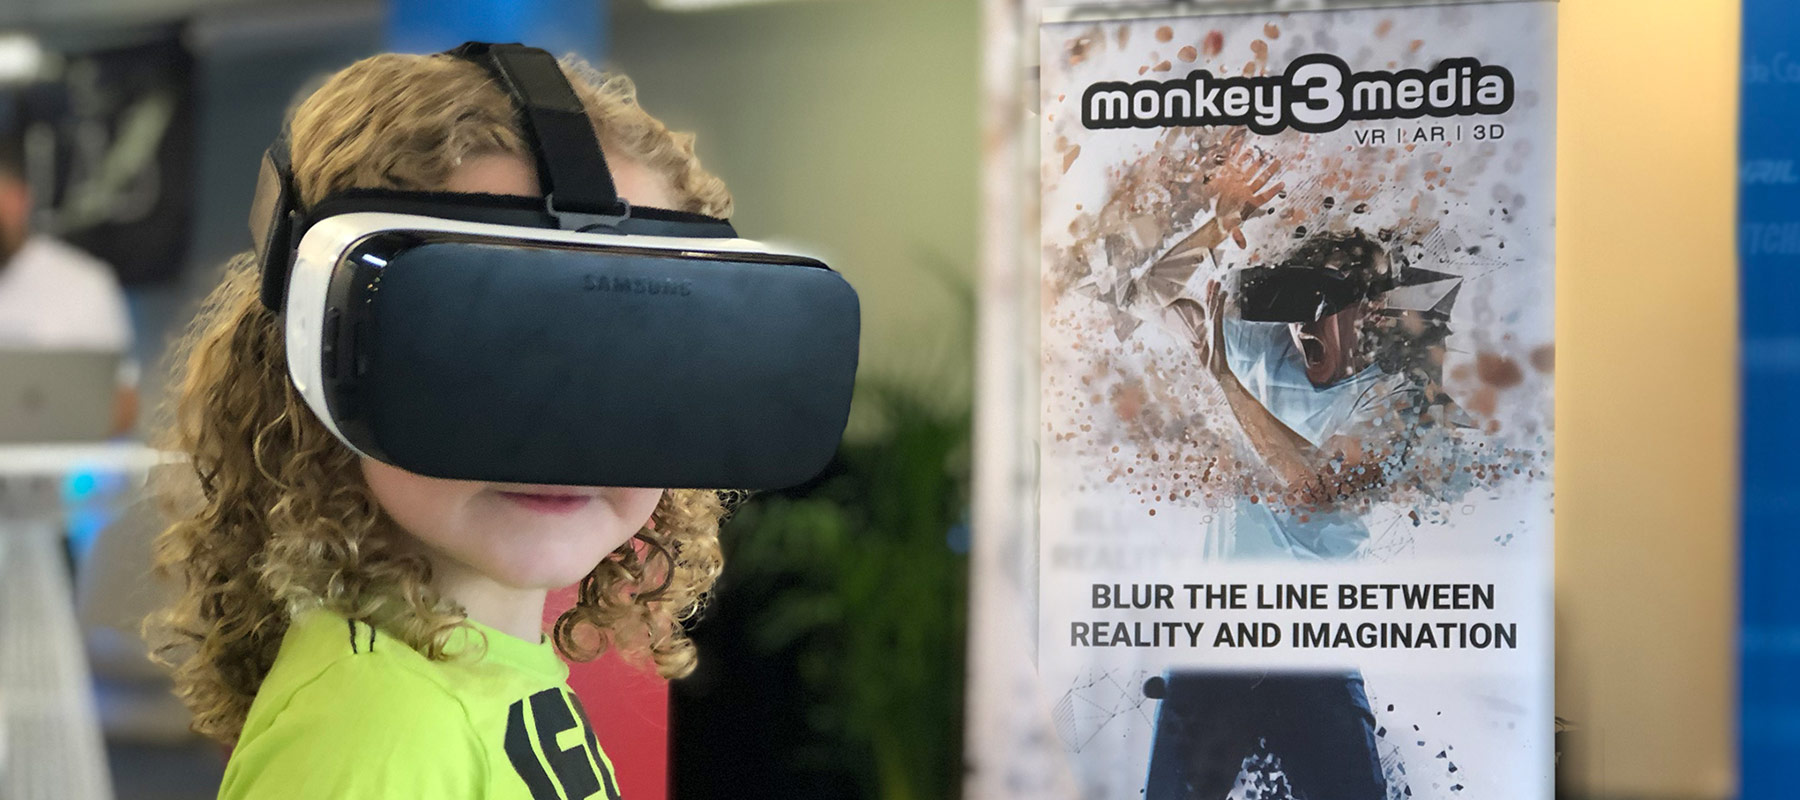 Explore Mackay 360 VR Experience